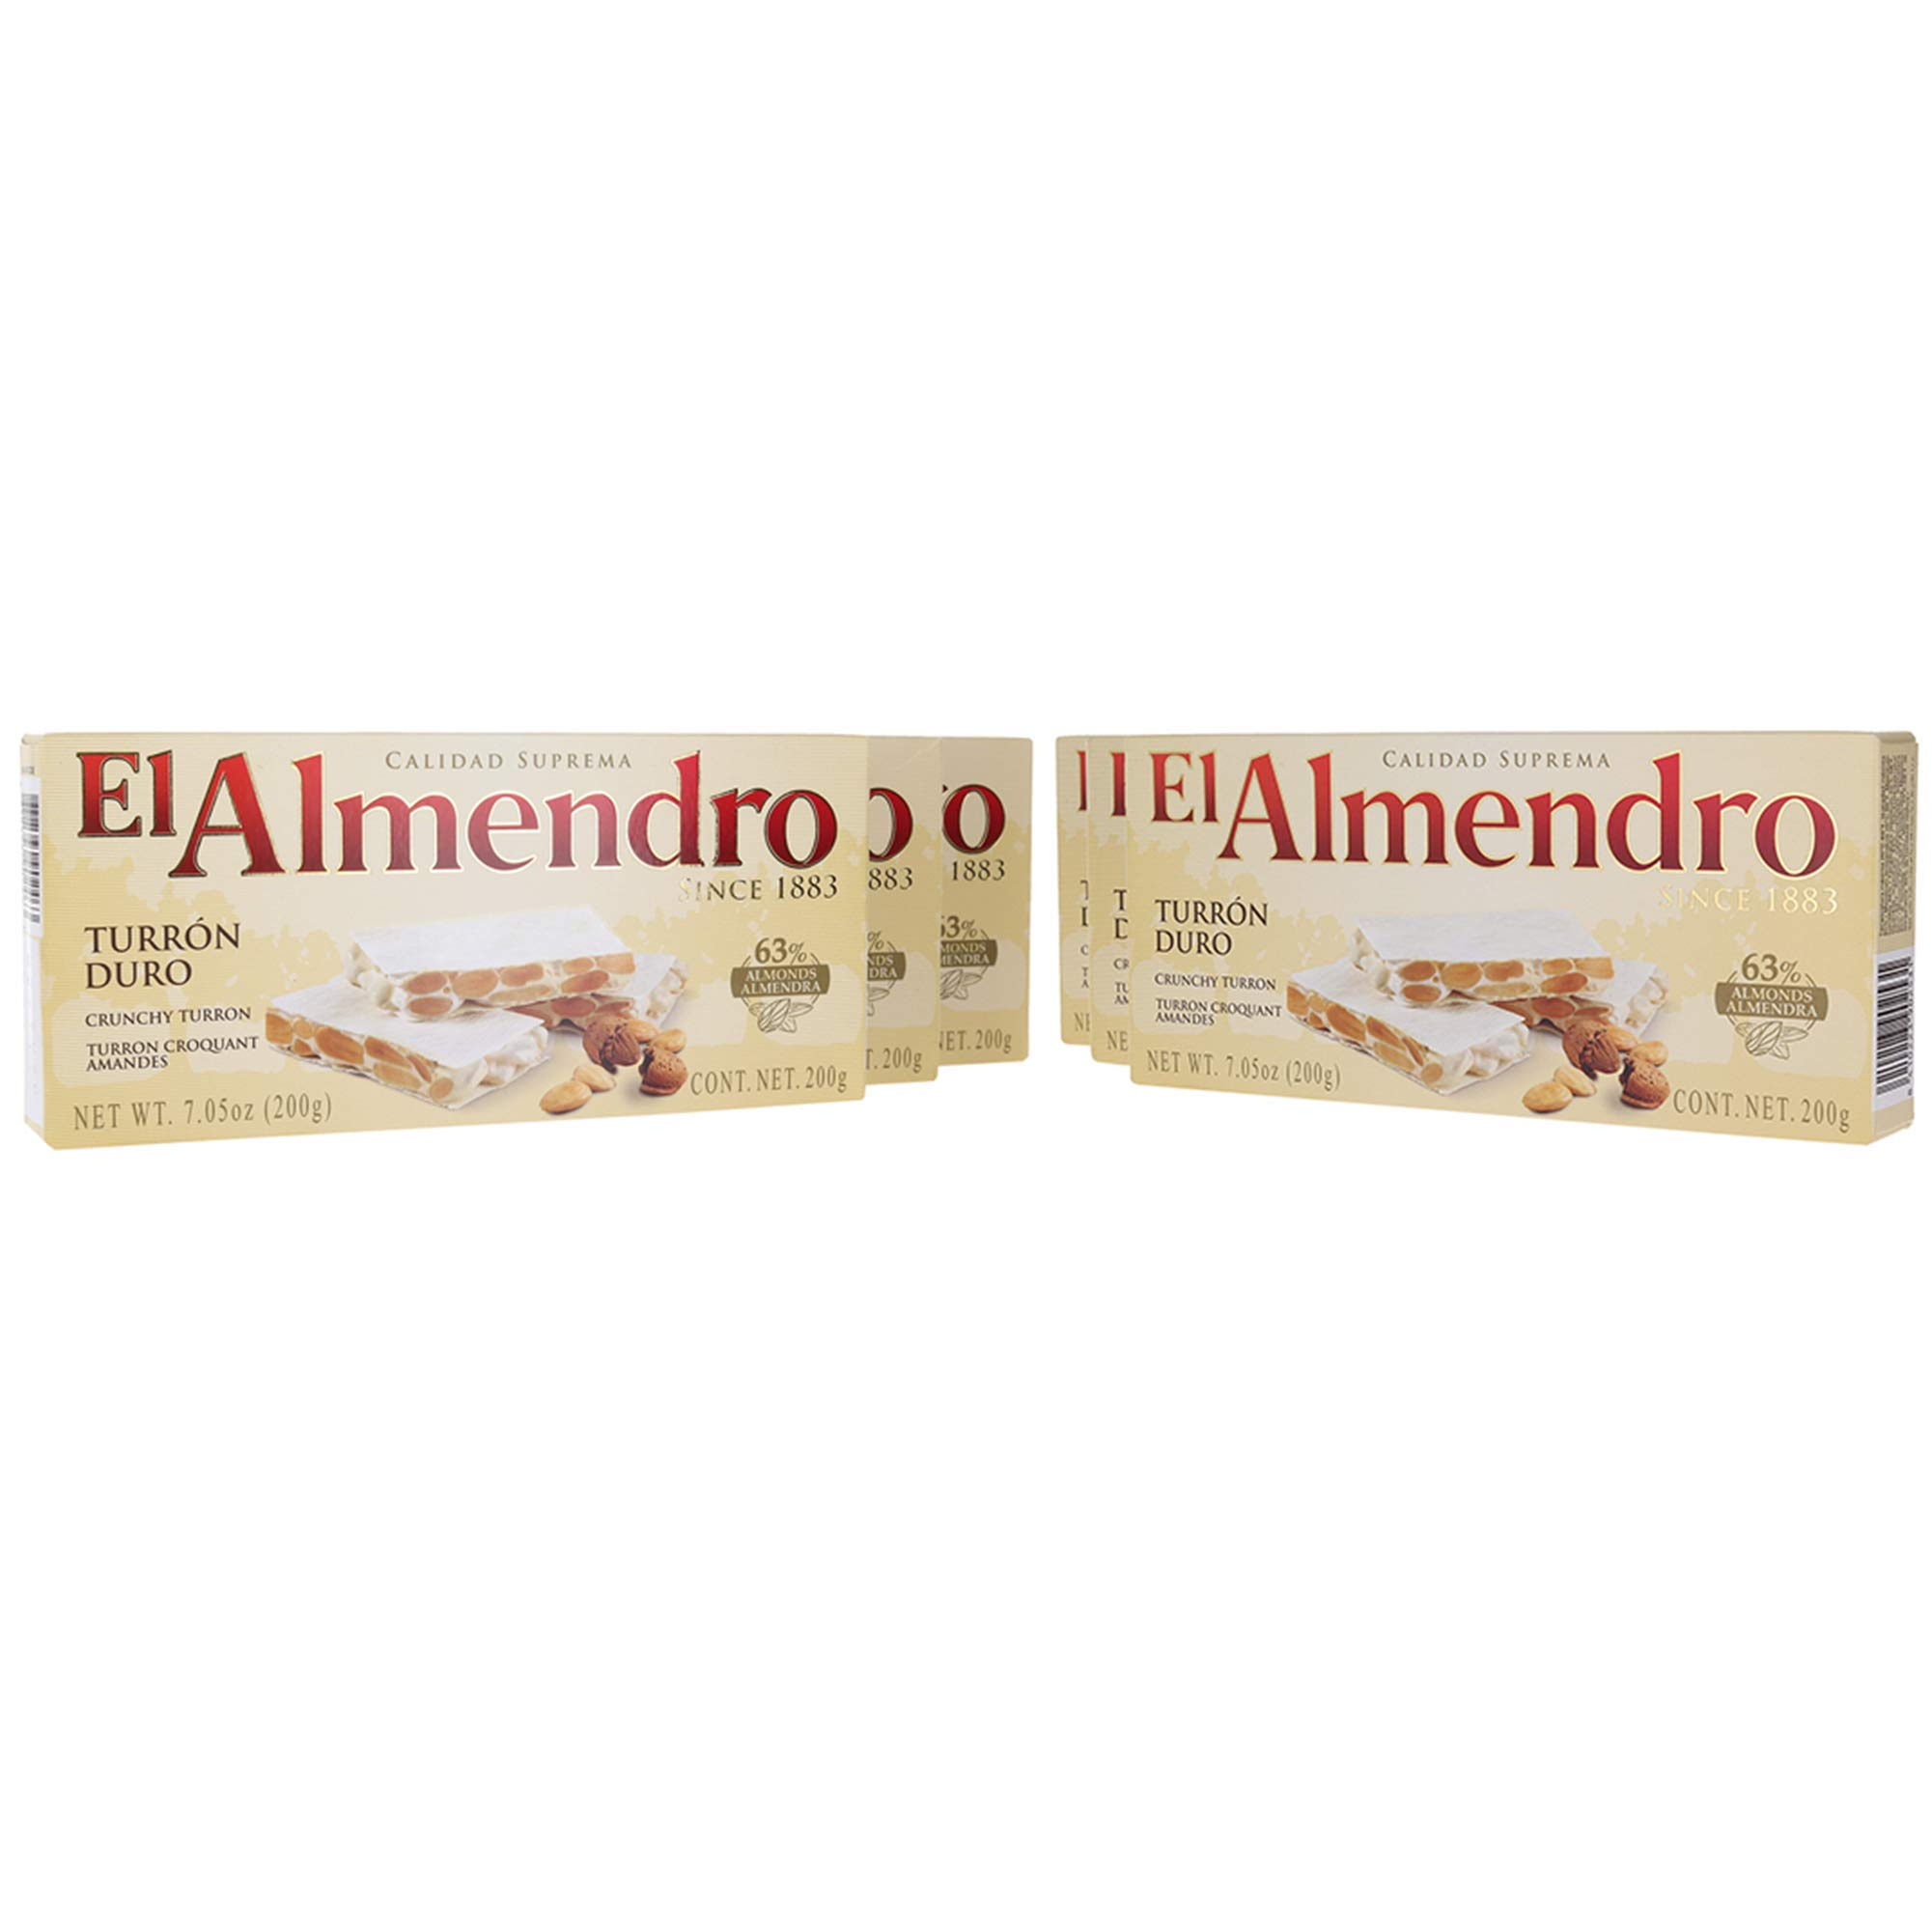 El Almendro Turron Crunchy Nougat - (6 Pack) by El Almendro